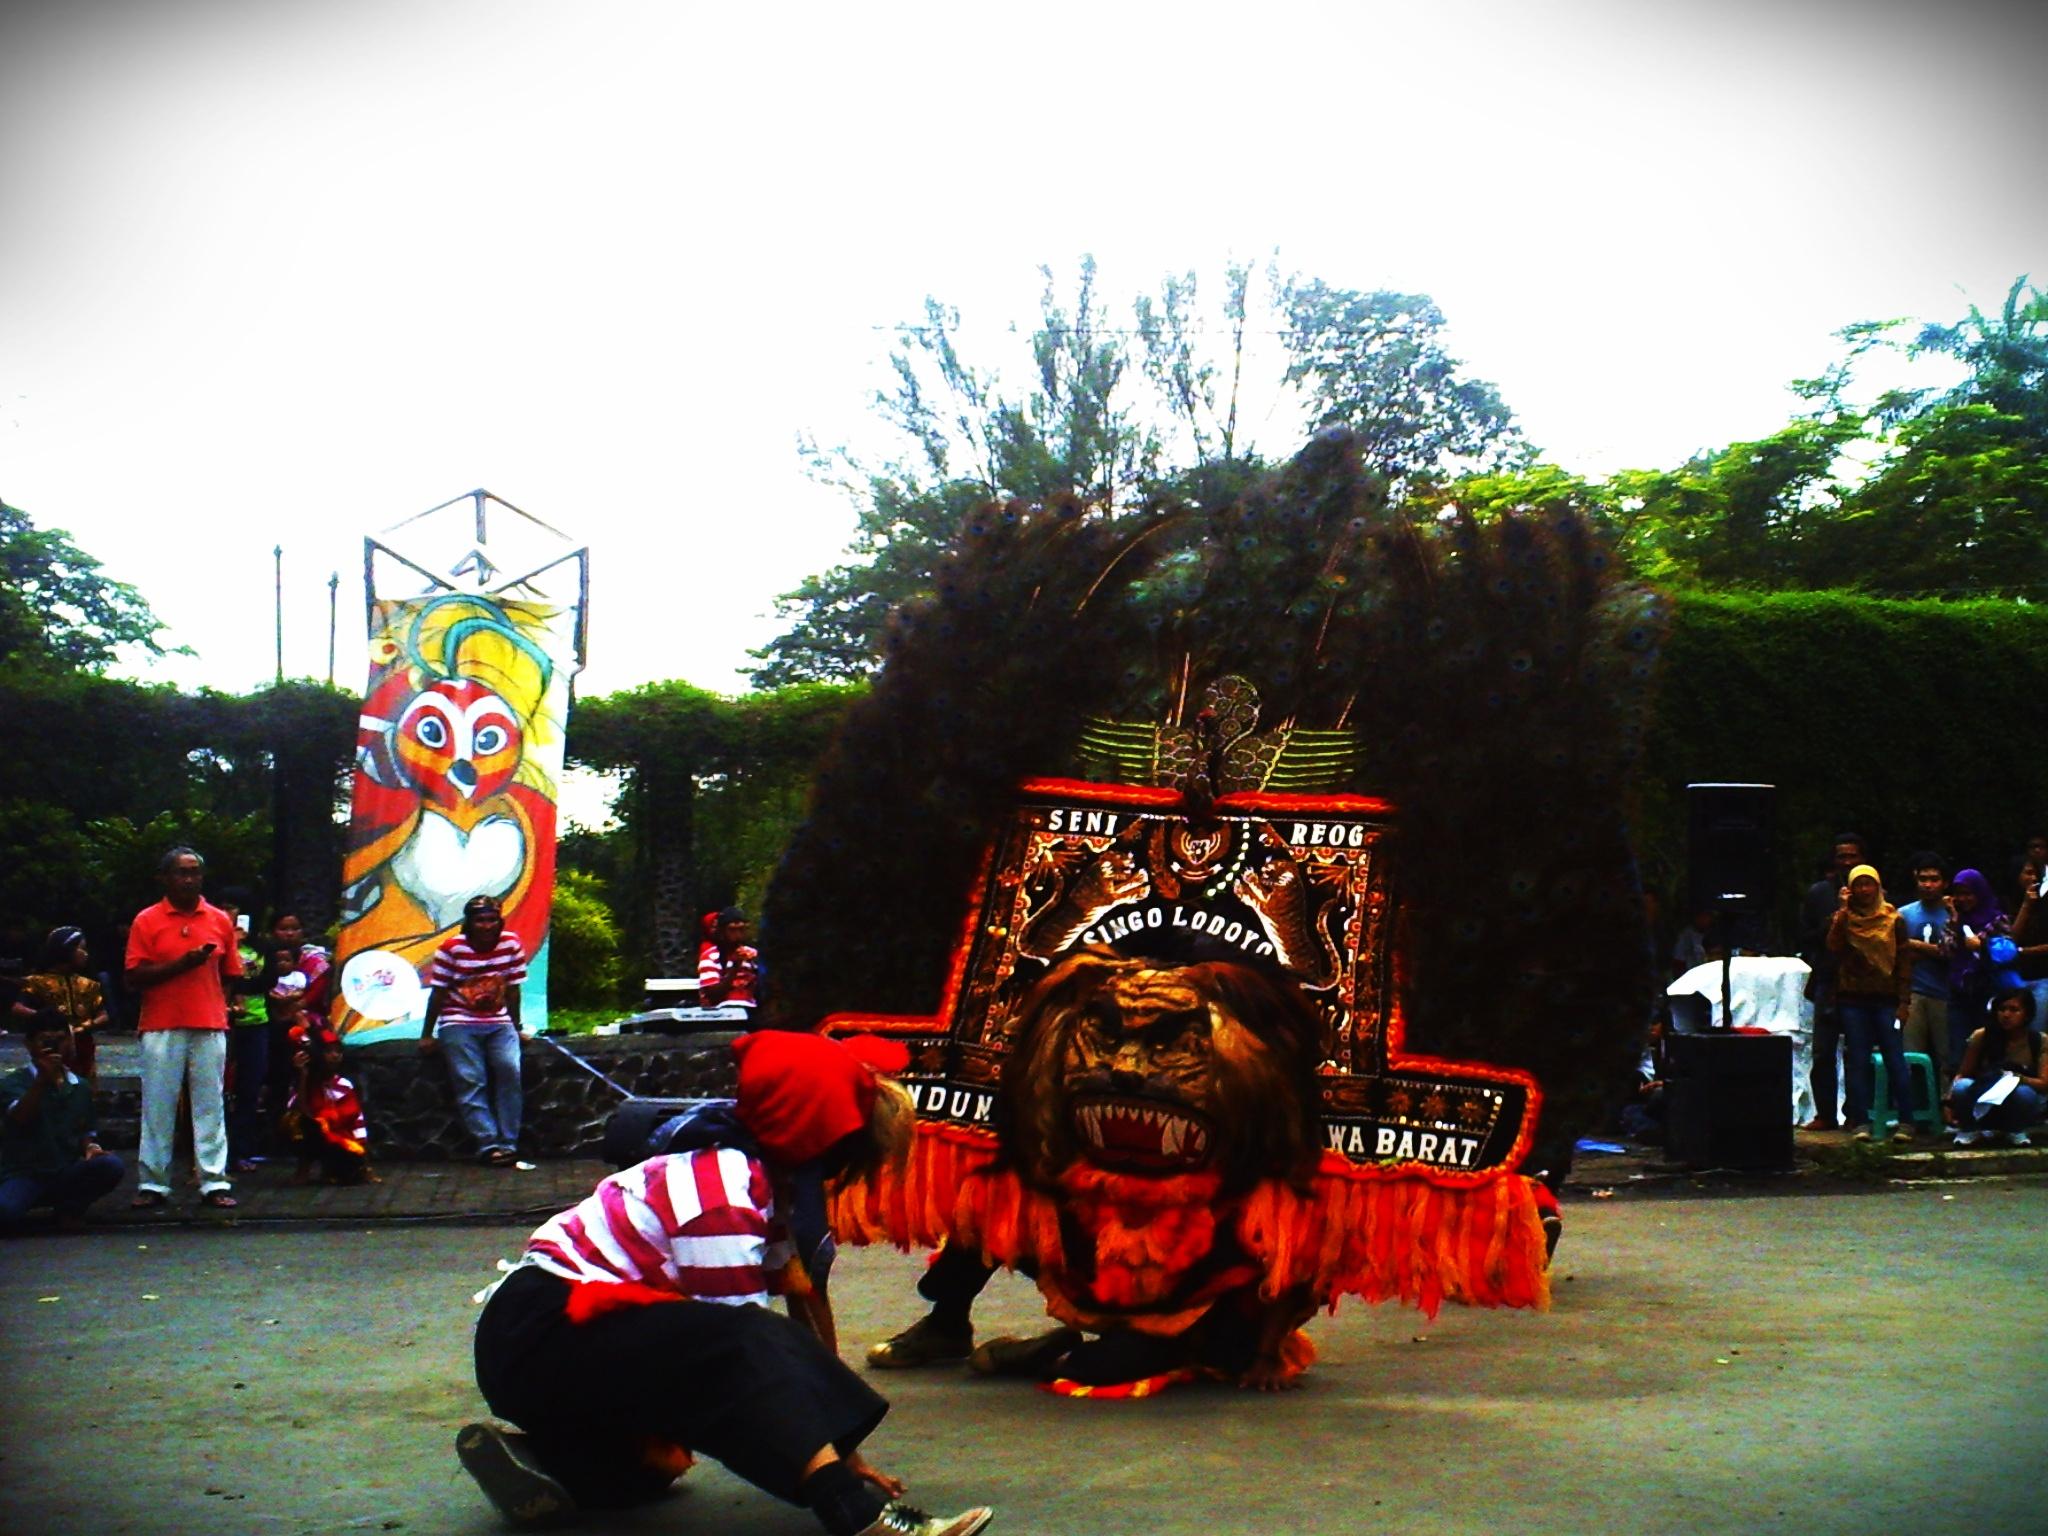 Reog Ponorogo khas Ponorogo Jawa Timur sama Sisingaan khas Subang Jawa Barat jadi sajian utama opening pagi tadi Wooow Seru pisan